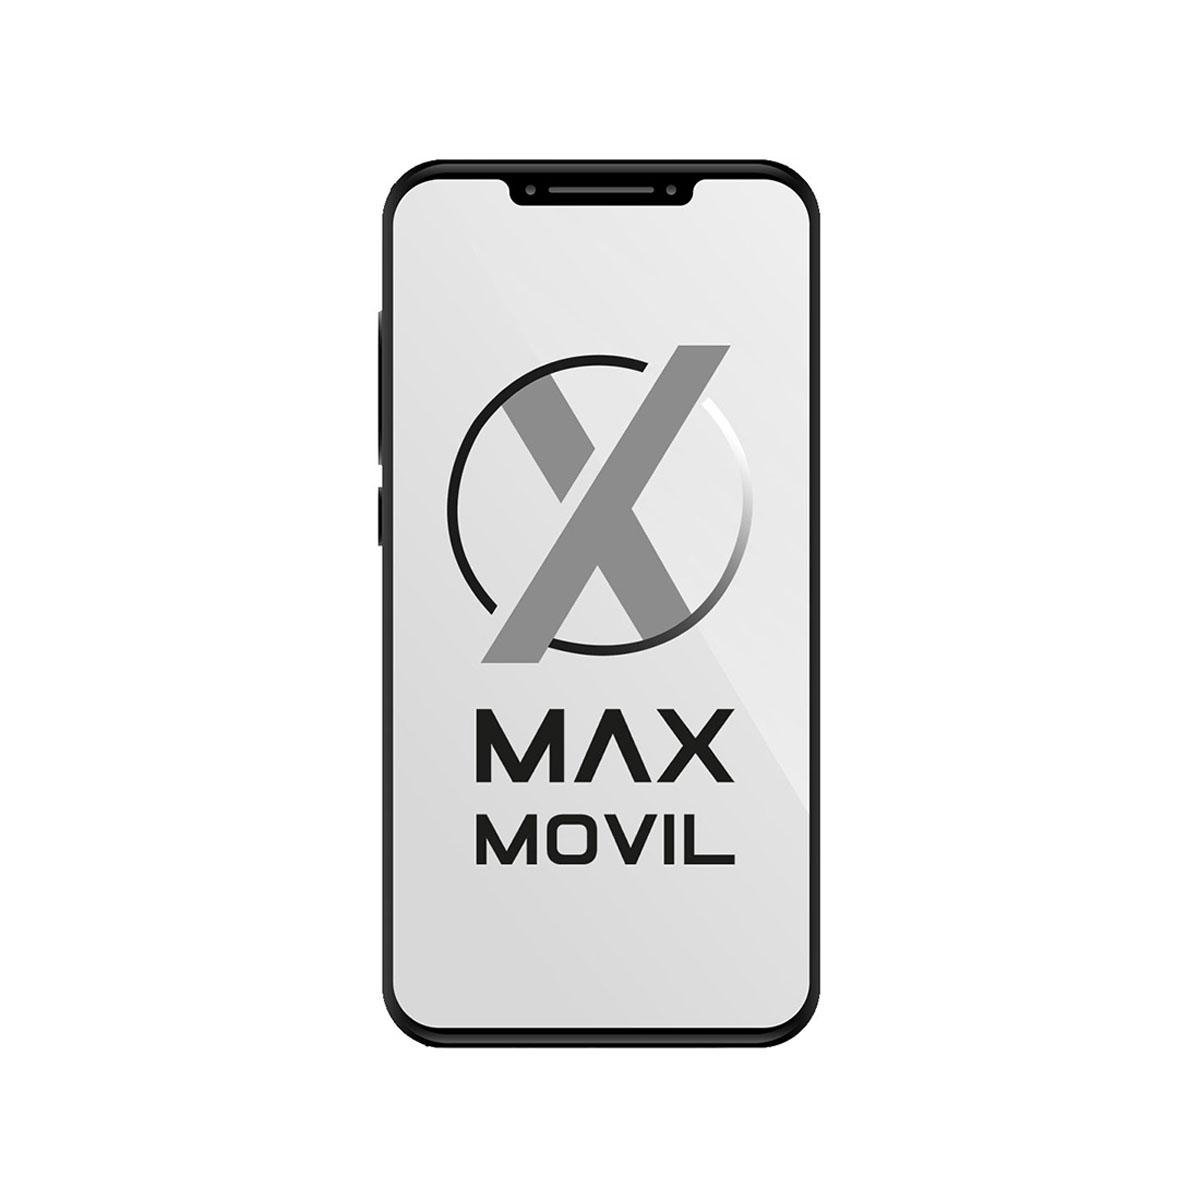 Funda Roxfit book case para Sony Xperia Z5